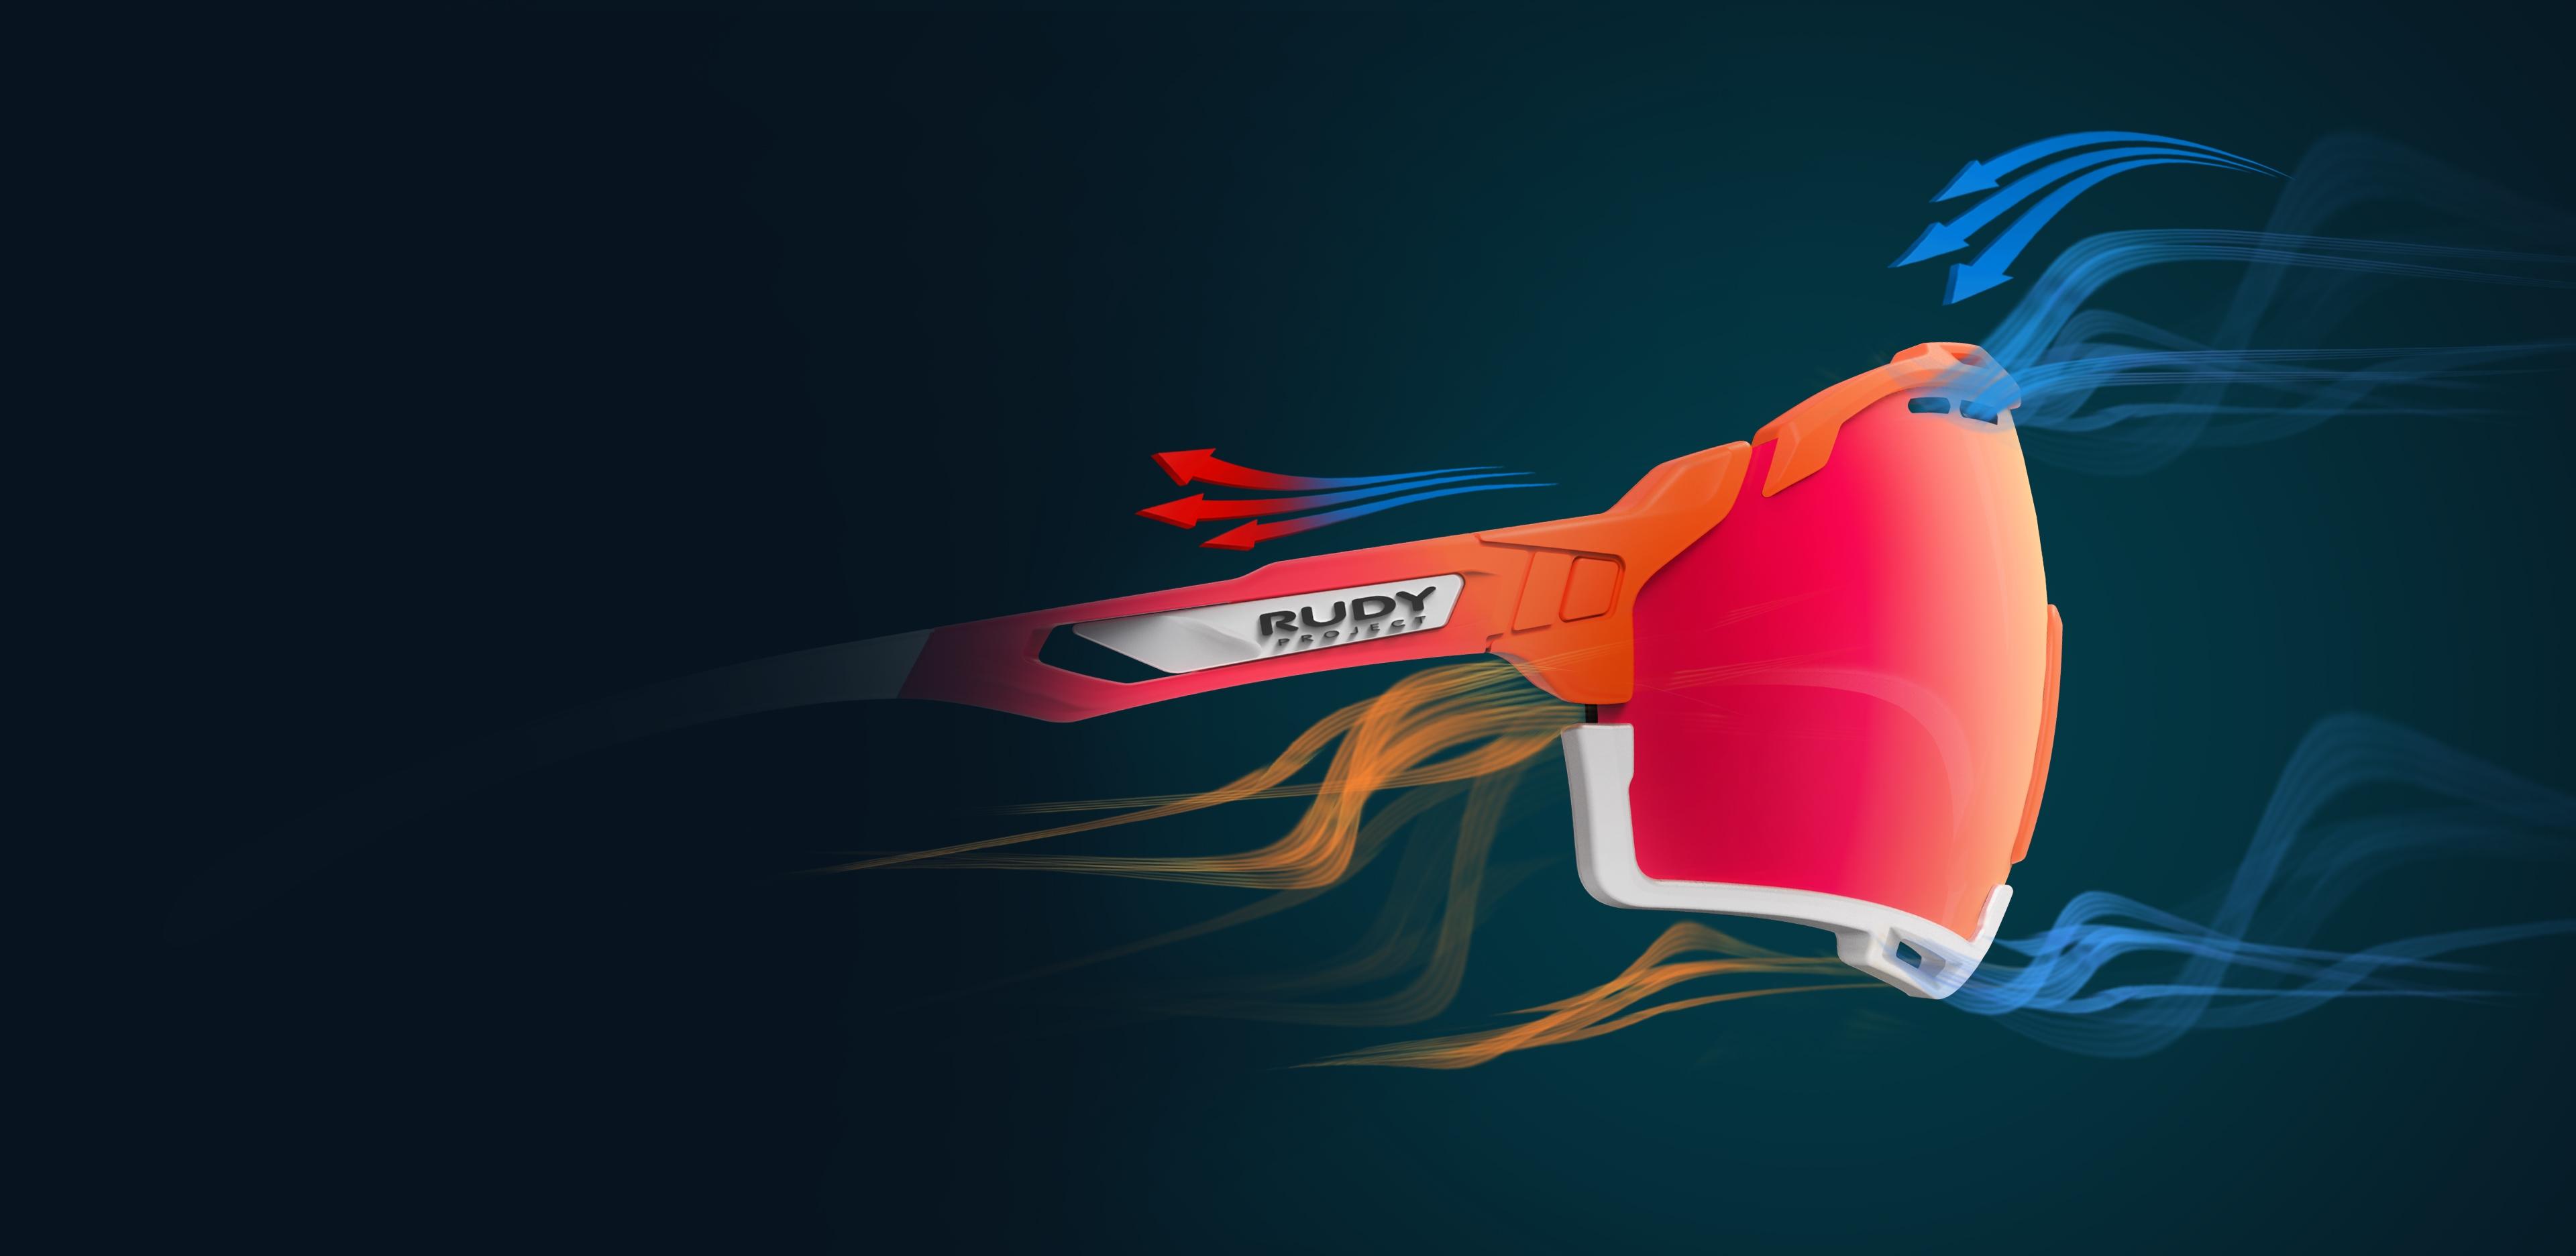 Aerisire ochelari sport Cutline - Rudy Project